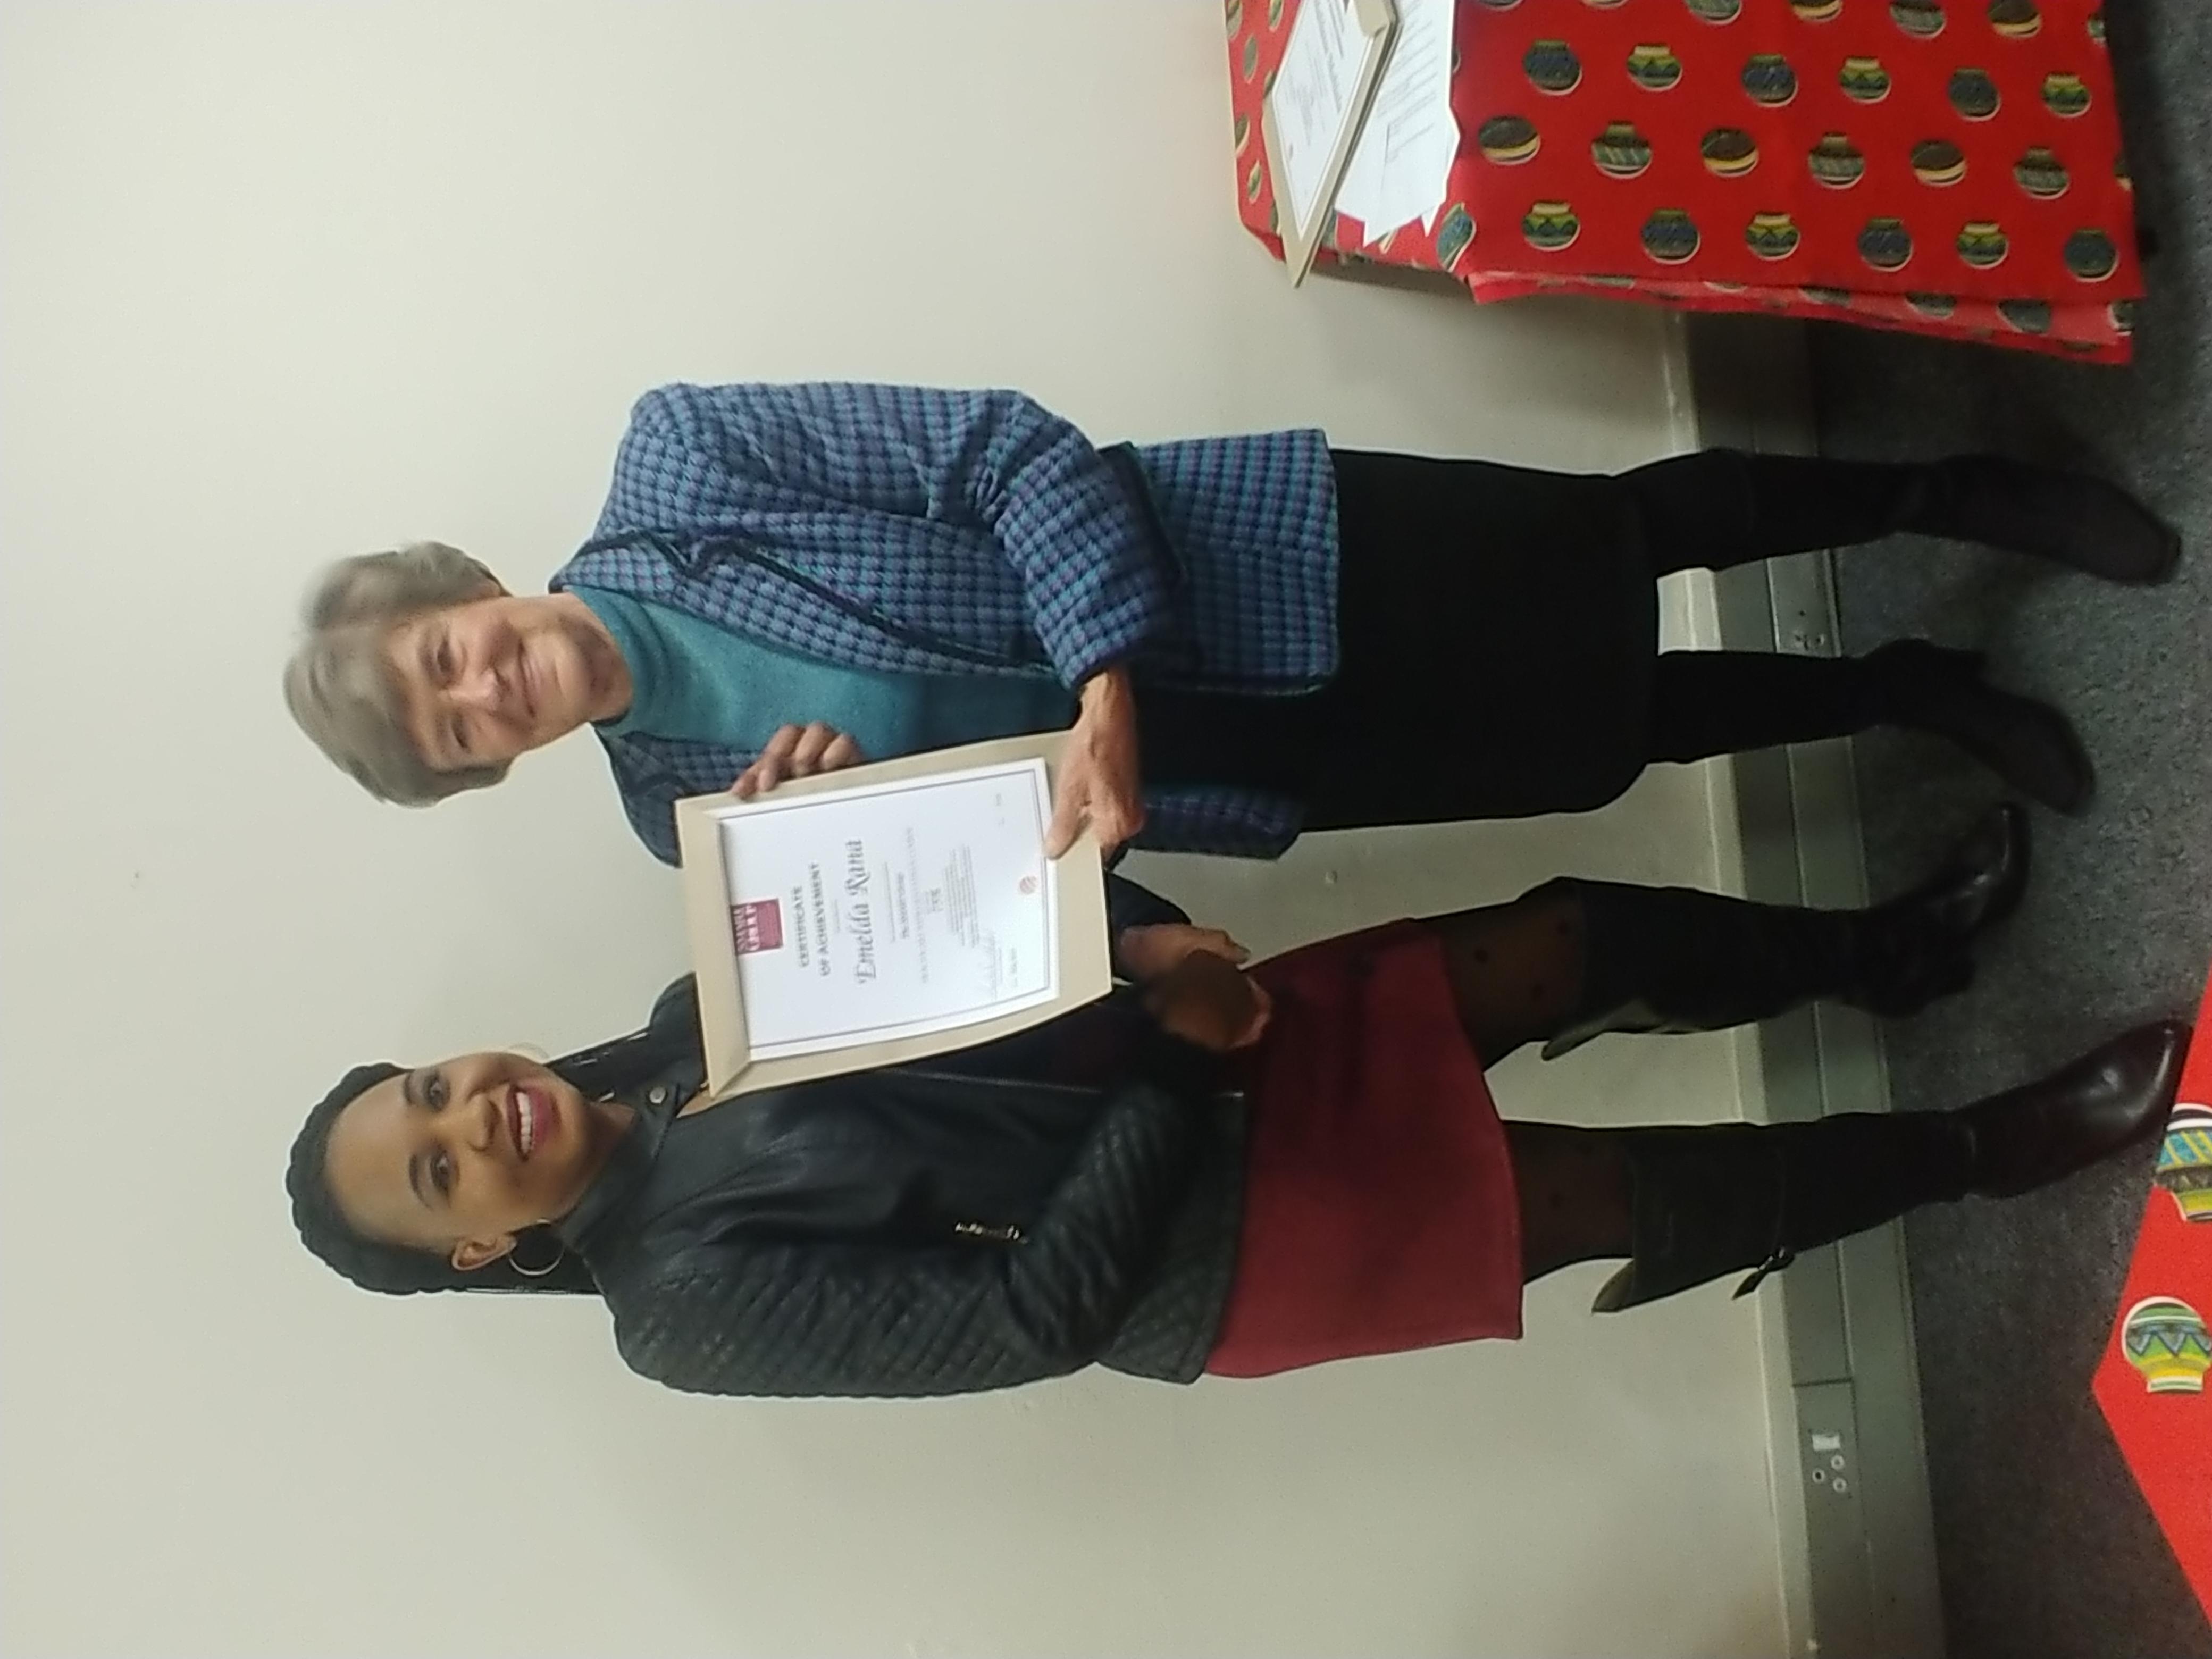 Congratulations Emelda Rana